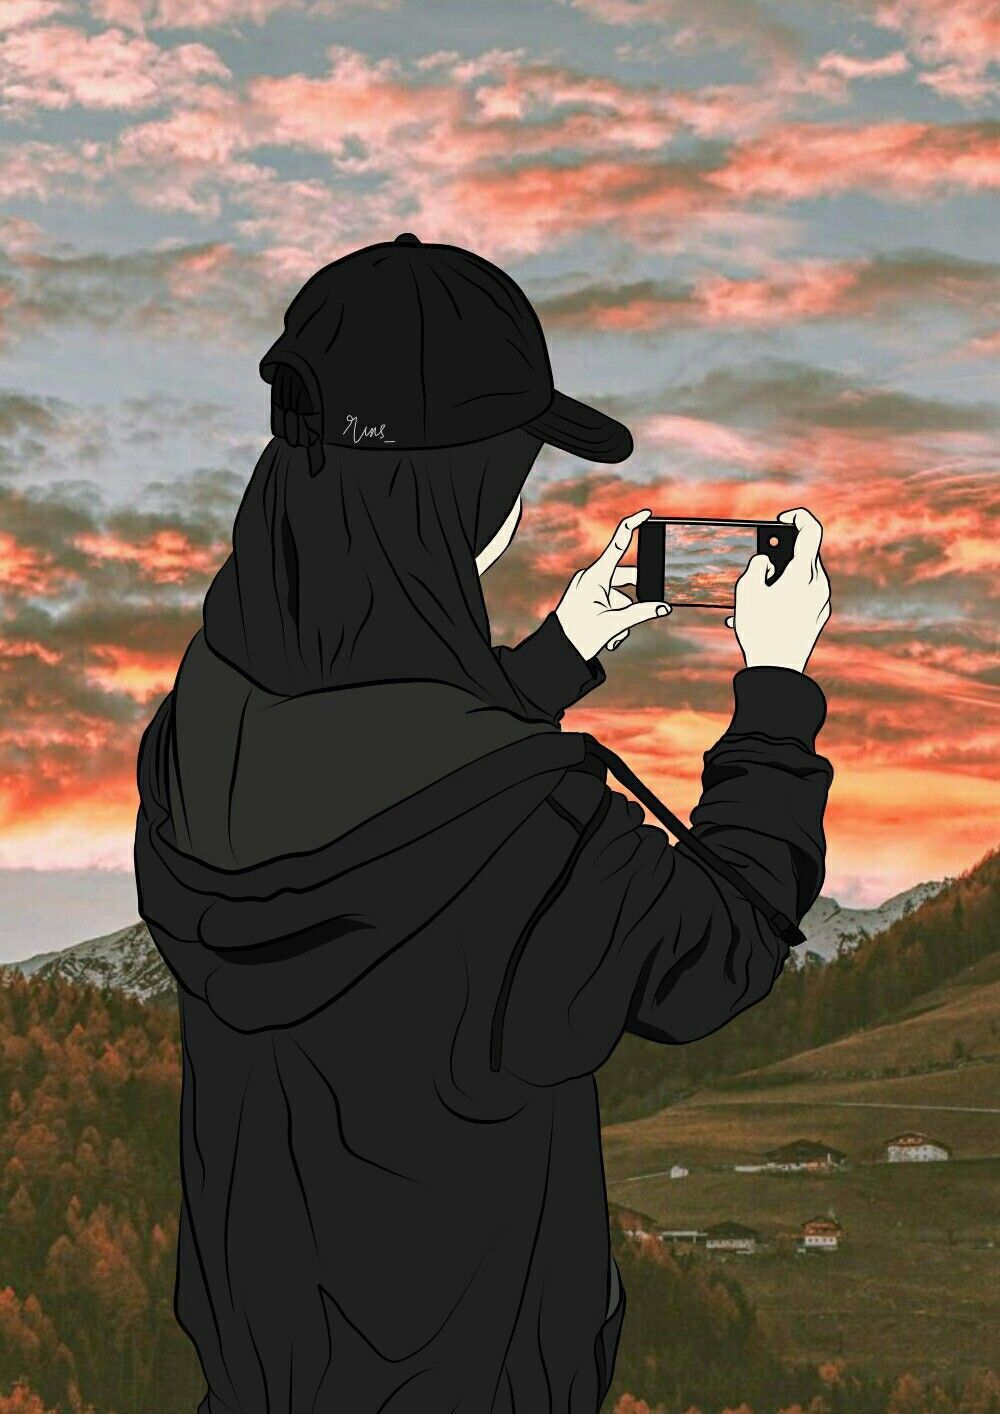 Anime Girls Islamic Wallpapers - Top Free Anime Girls Islamic